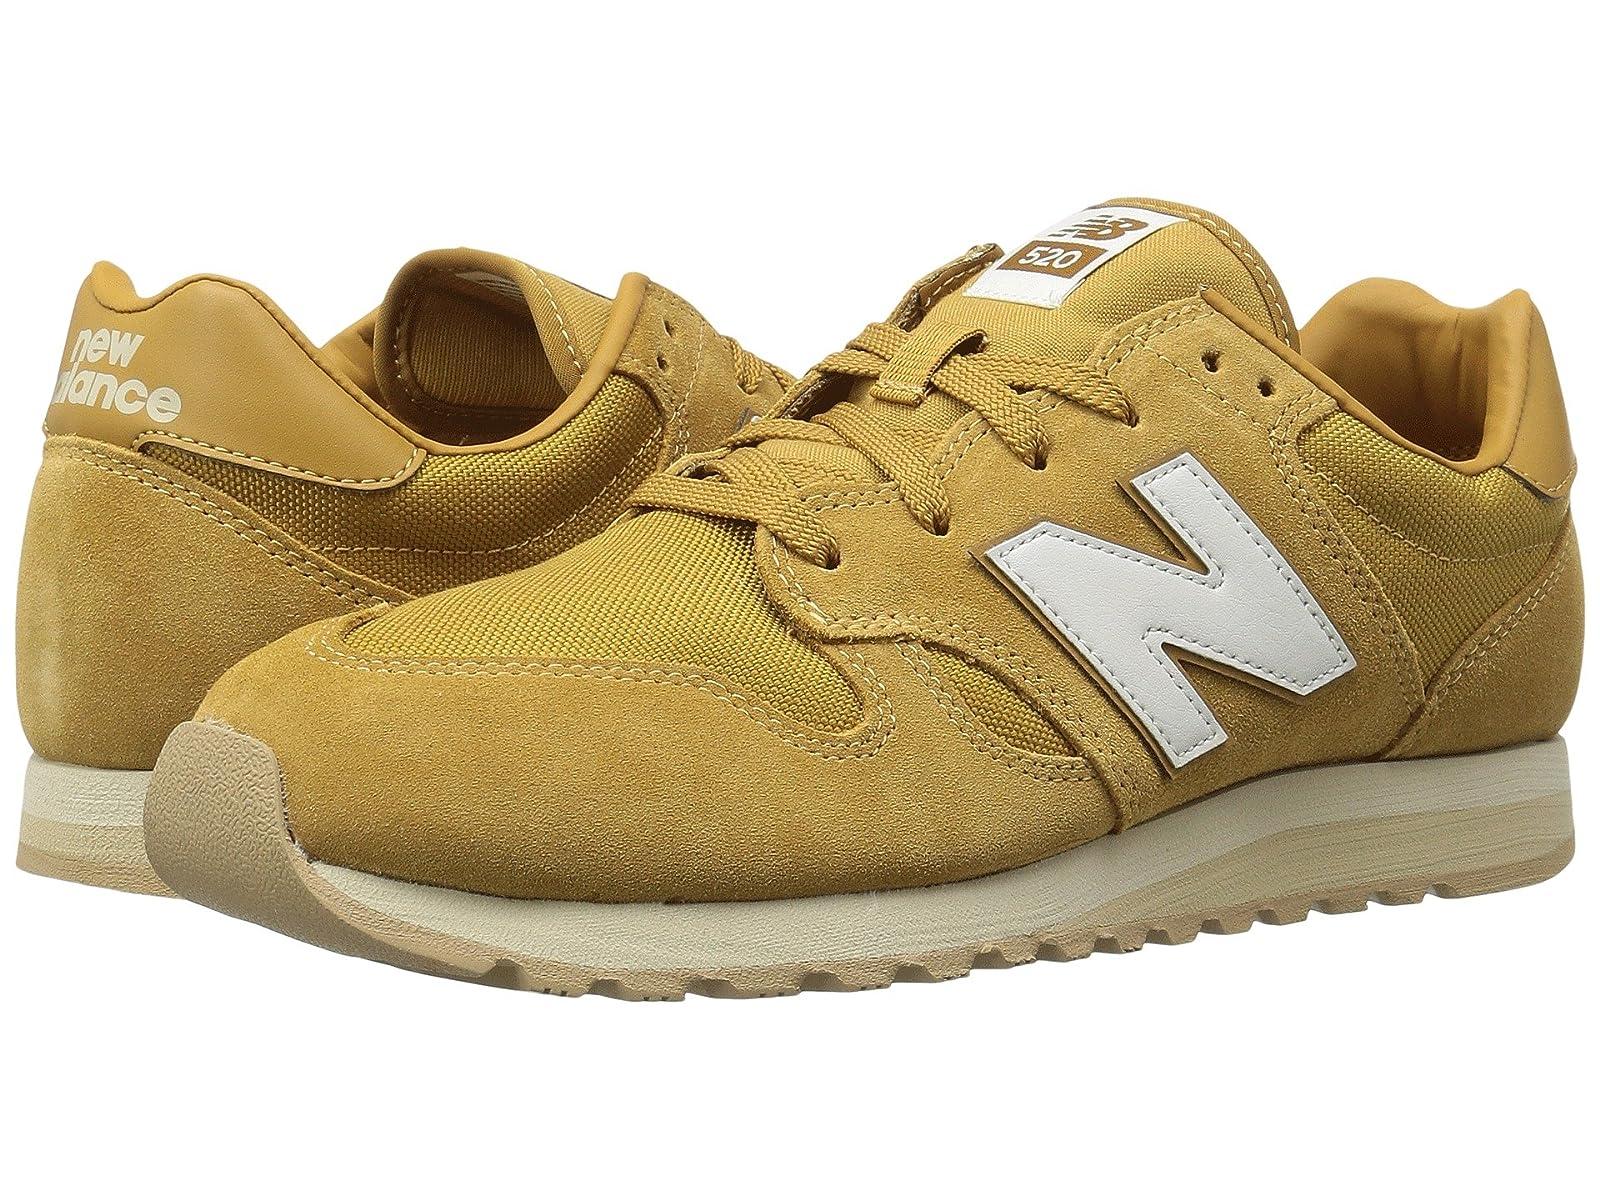 New Balance Classics U520v1Cheap and distinctive eye-catching shoes